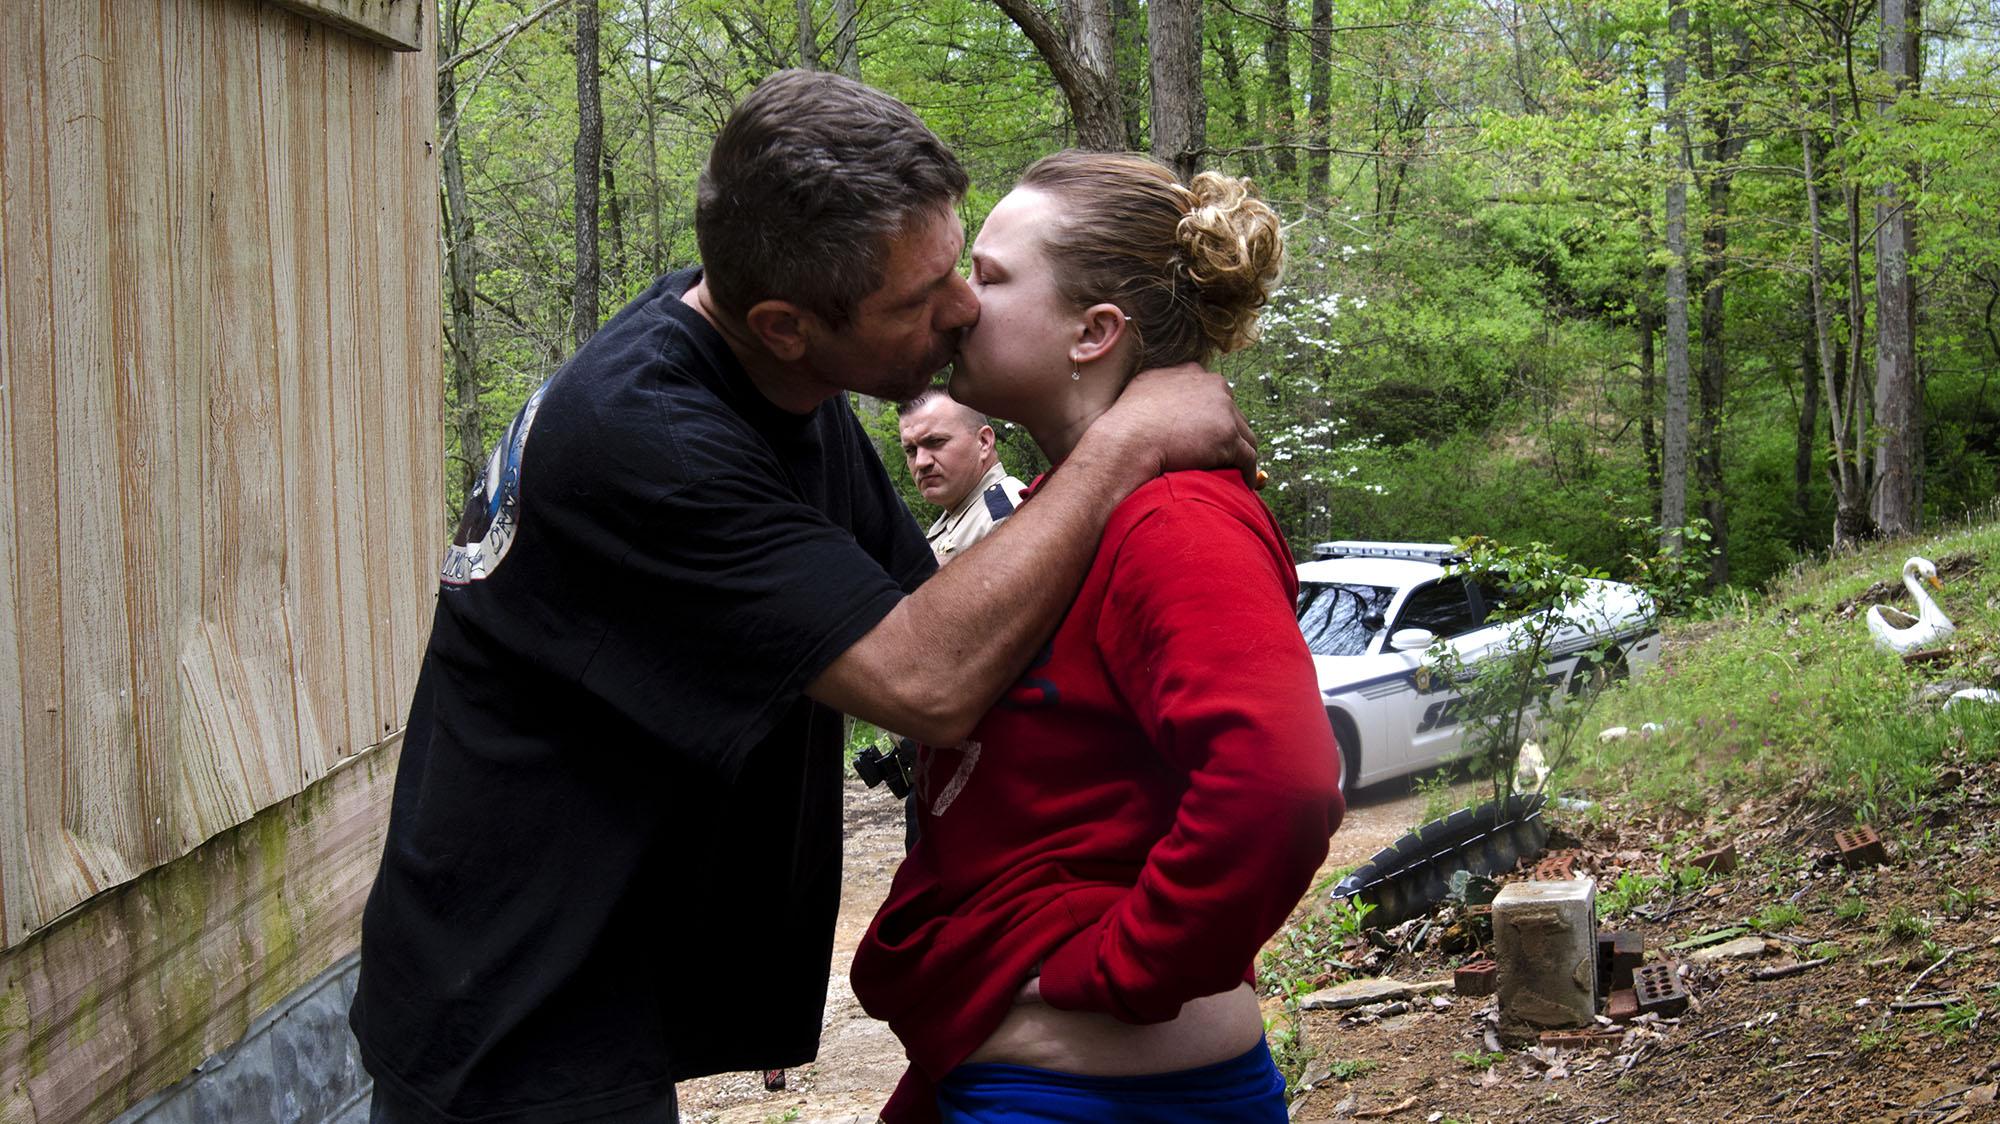 Couple trailer trash earn some meth money